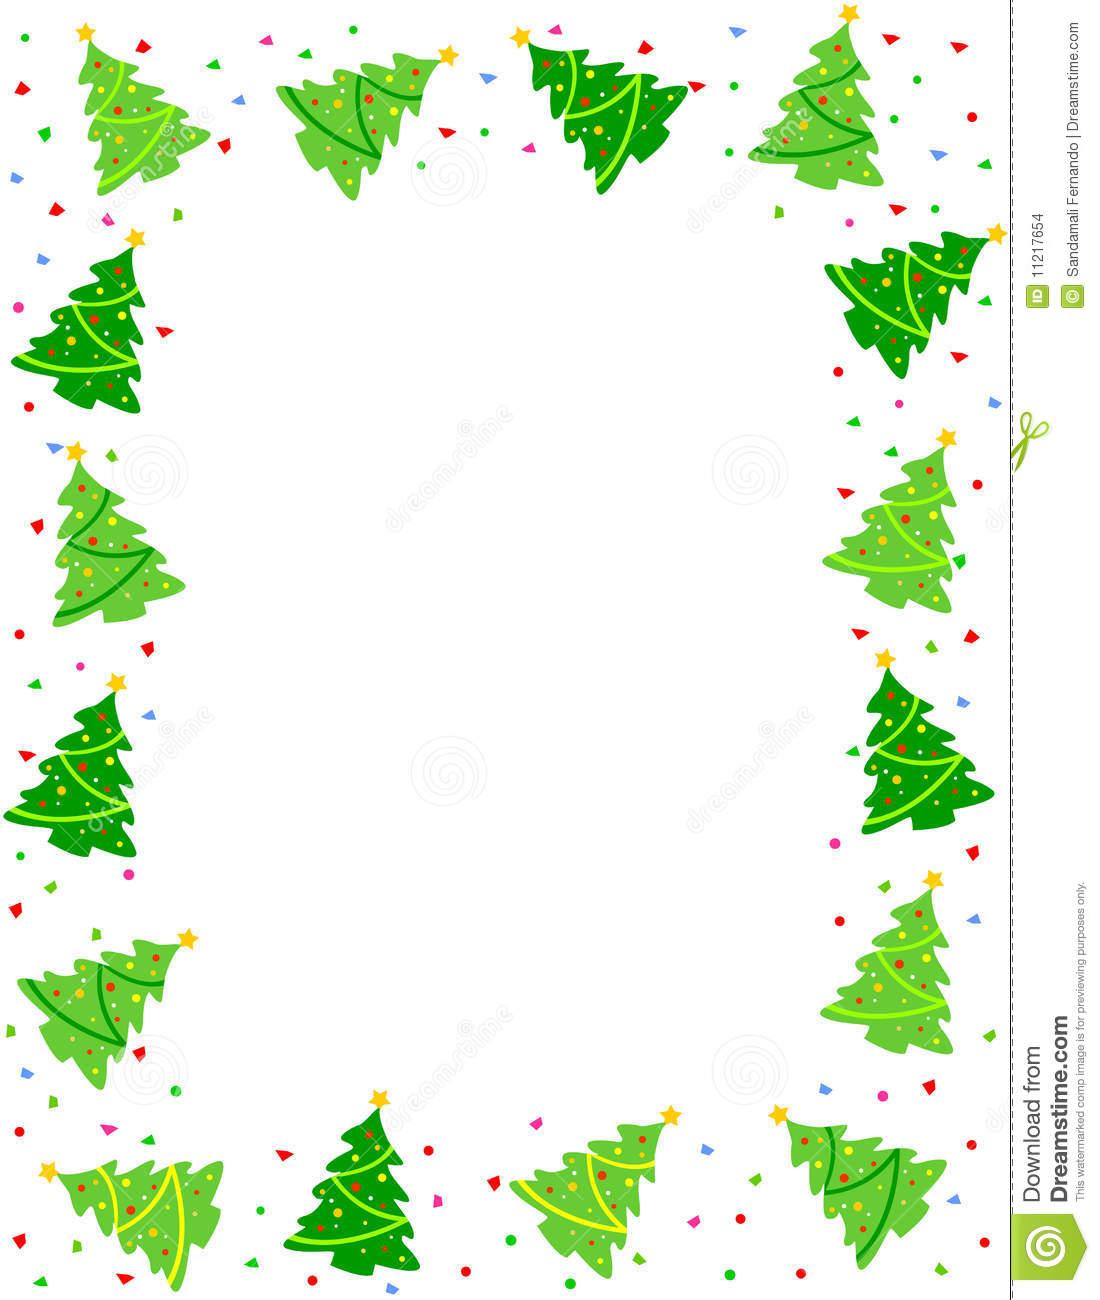 Christmas Tree Borders Clip Art Images P-Christmas Tree Borders Clip Art Images Pictures Becuo-18